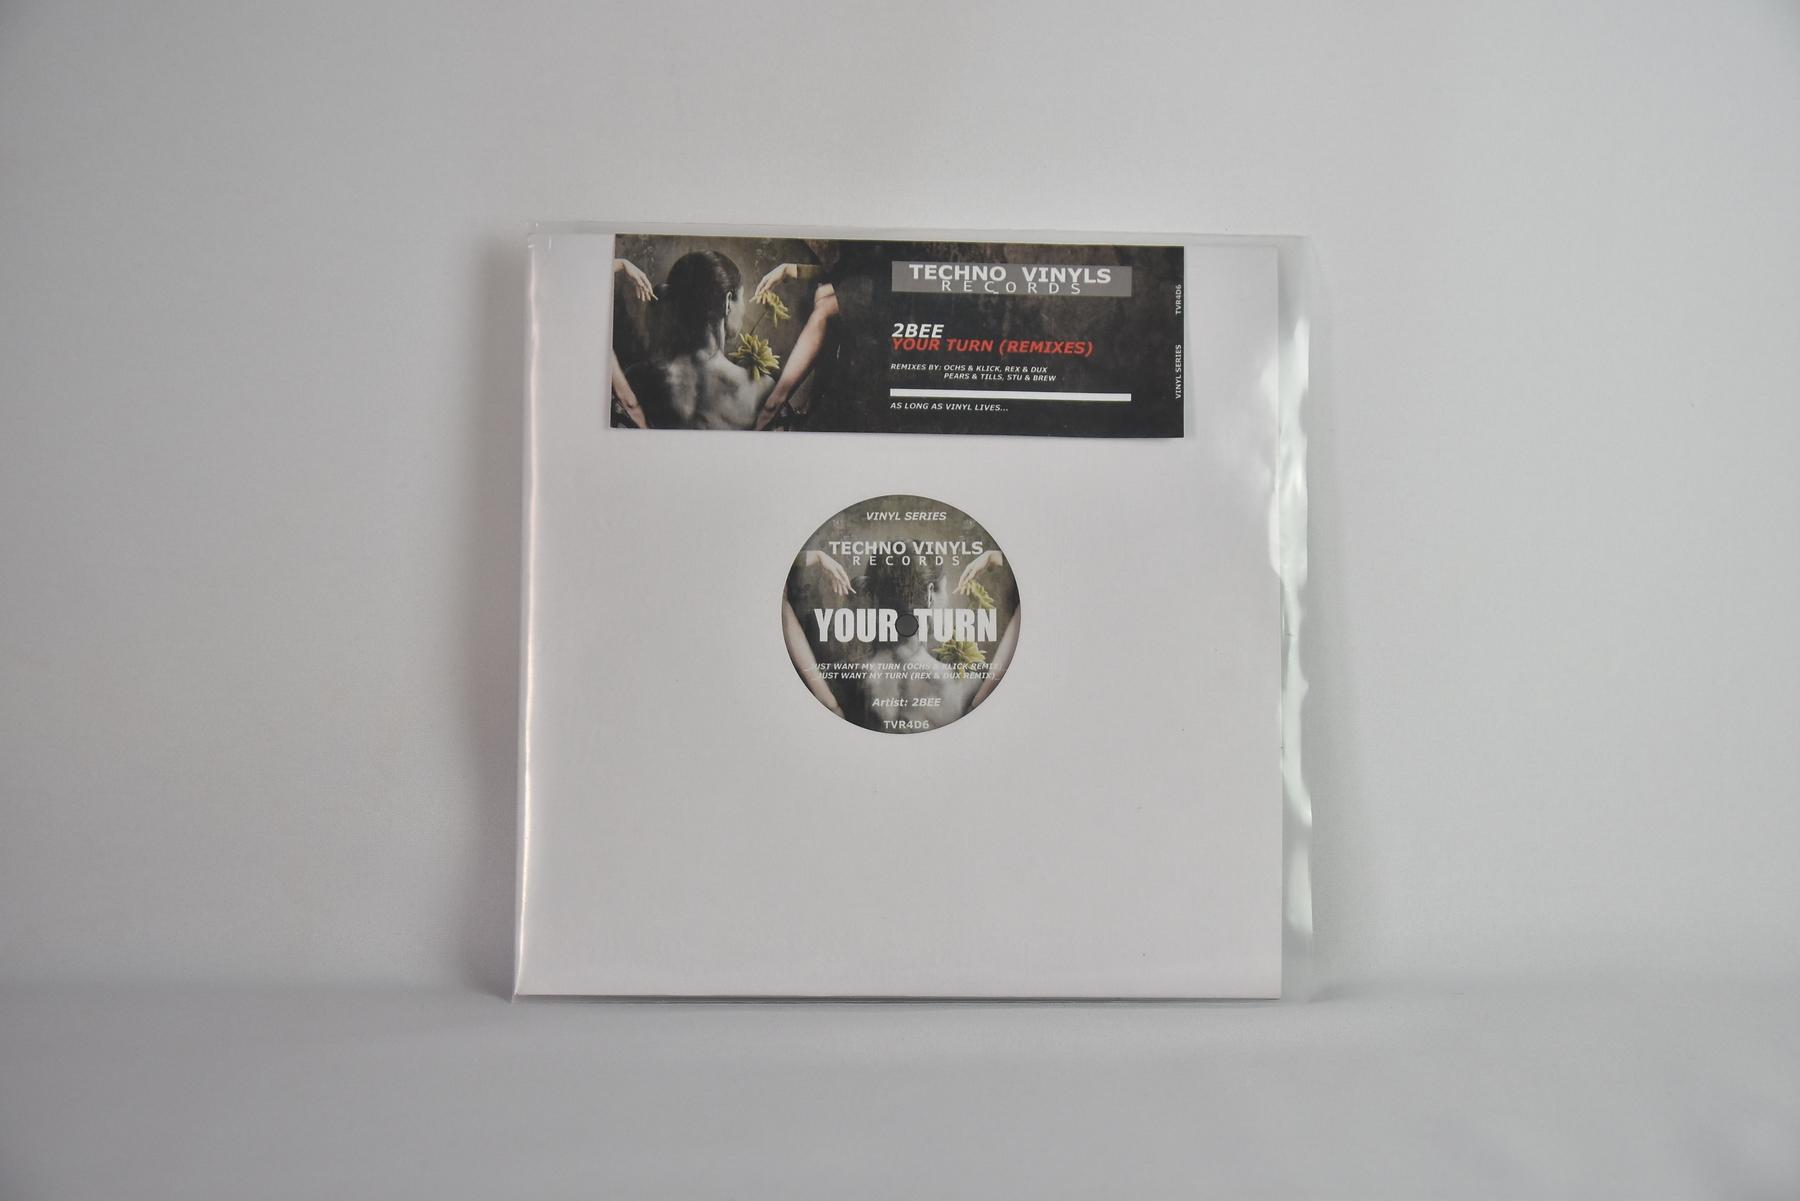 2bee – Your Turn (Remixes)